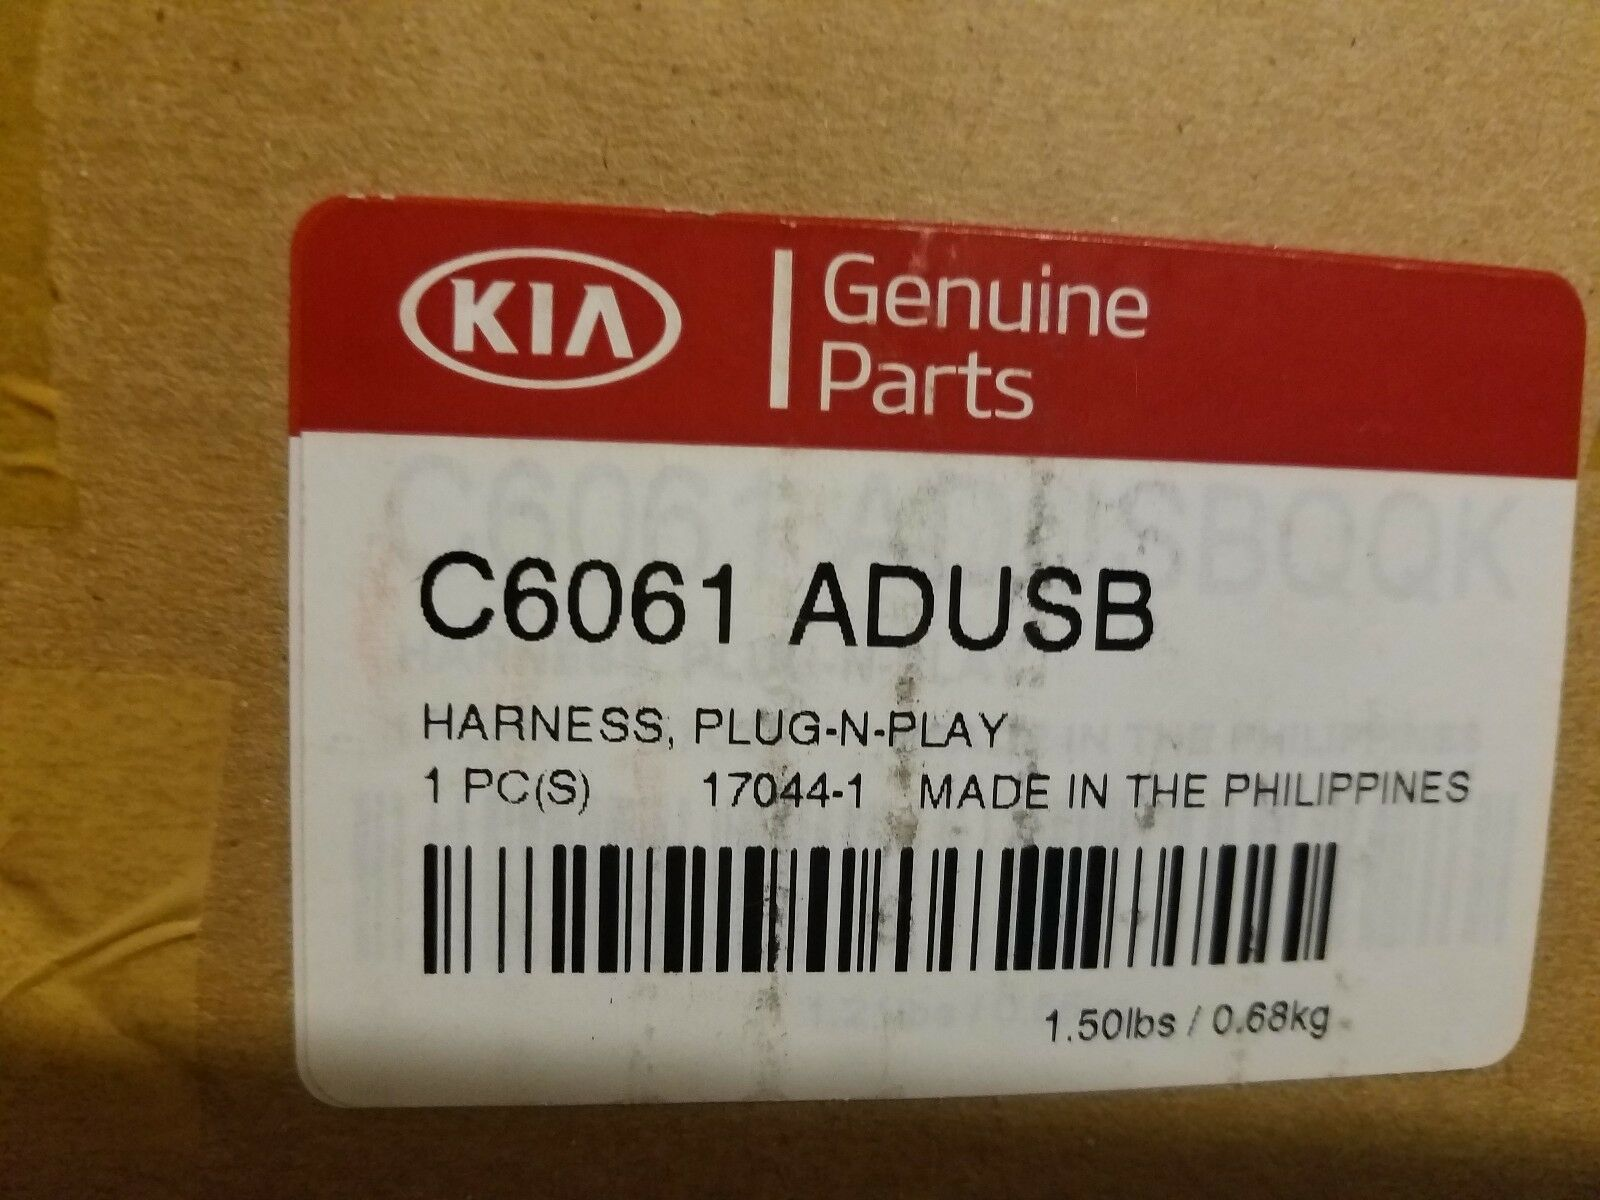 Genuine 2016 2017 Kia Sorento Tow Hitch Harness C6061 Adusb Ebay Trailer Wiring Norton Secured Powered By Verisign